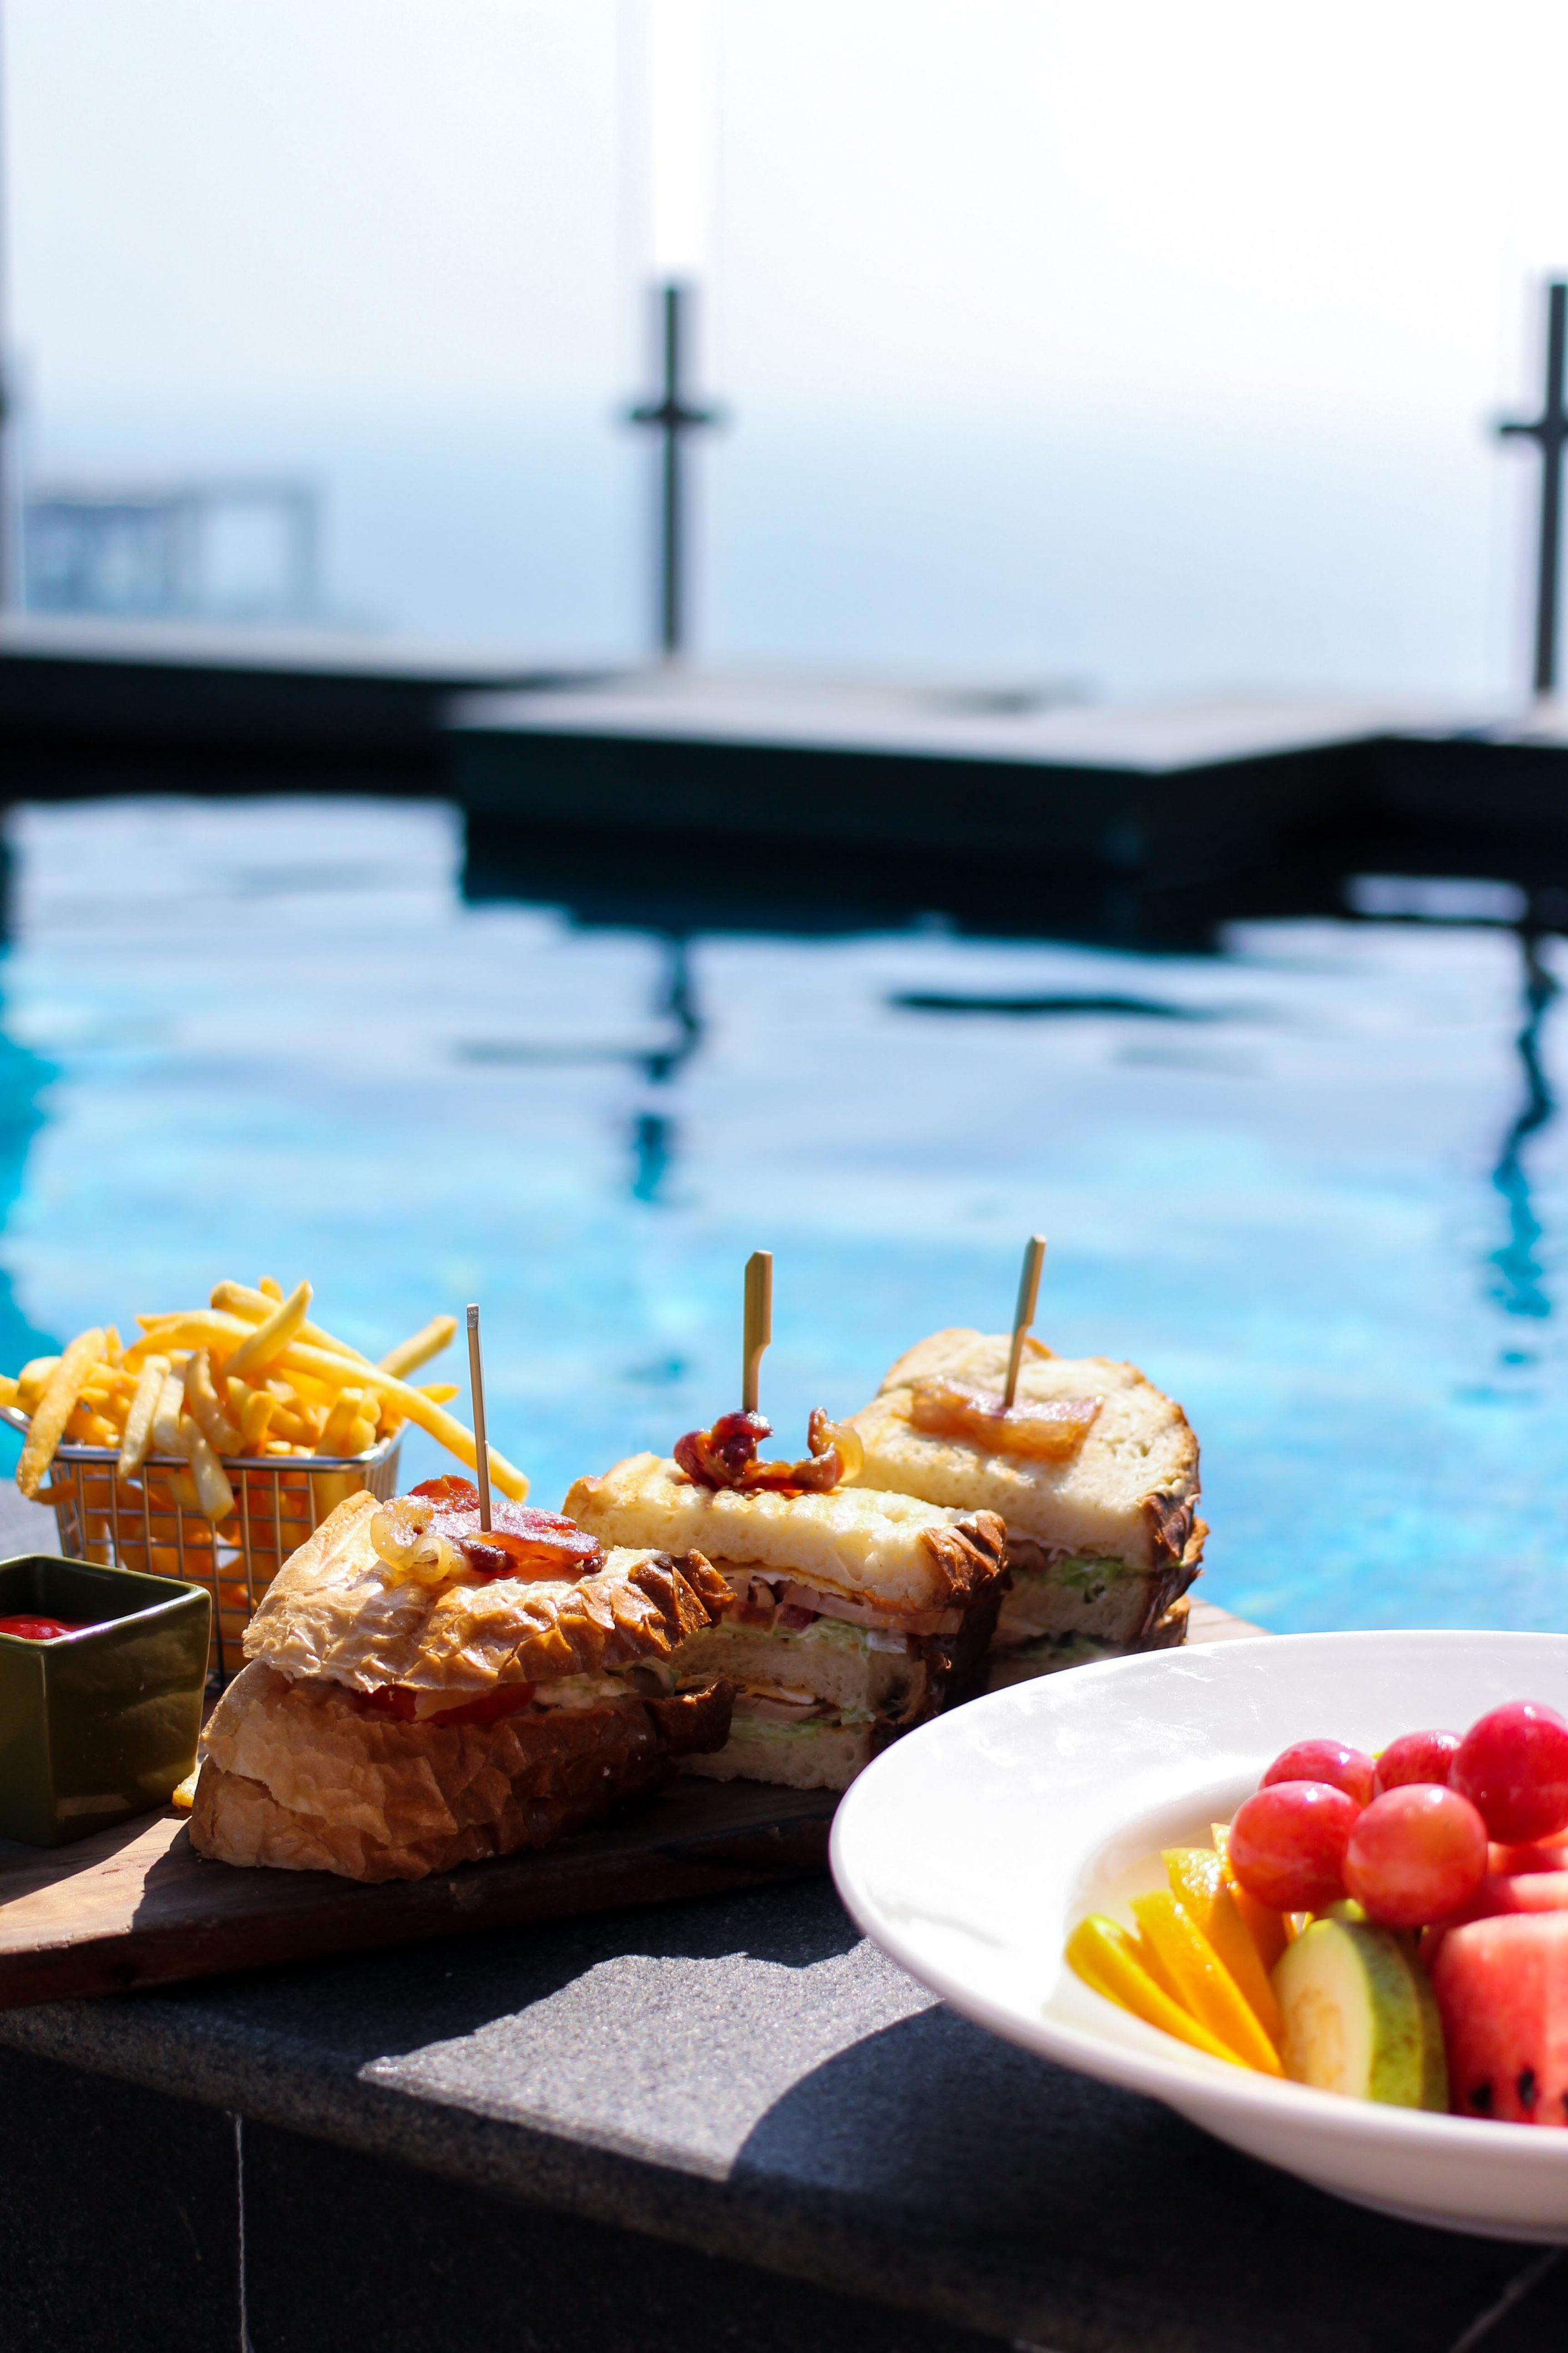 Mövenpick Colombo Hotel Reiseblog Whirlpool Brinisfashionbook Pool Snacks Sandwich Früchte Colombo bestes Hotel Sri Lanka.